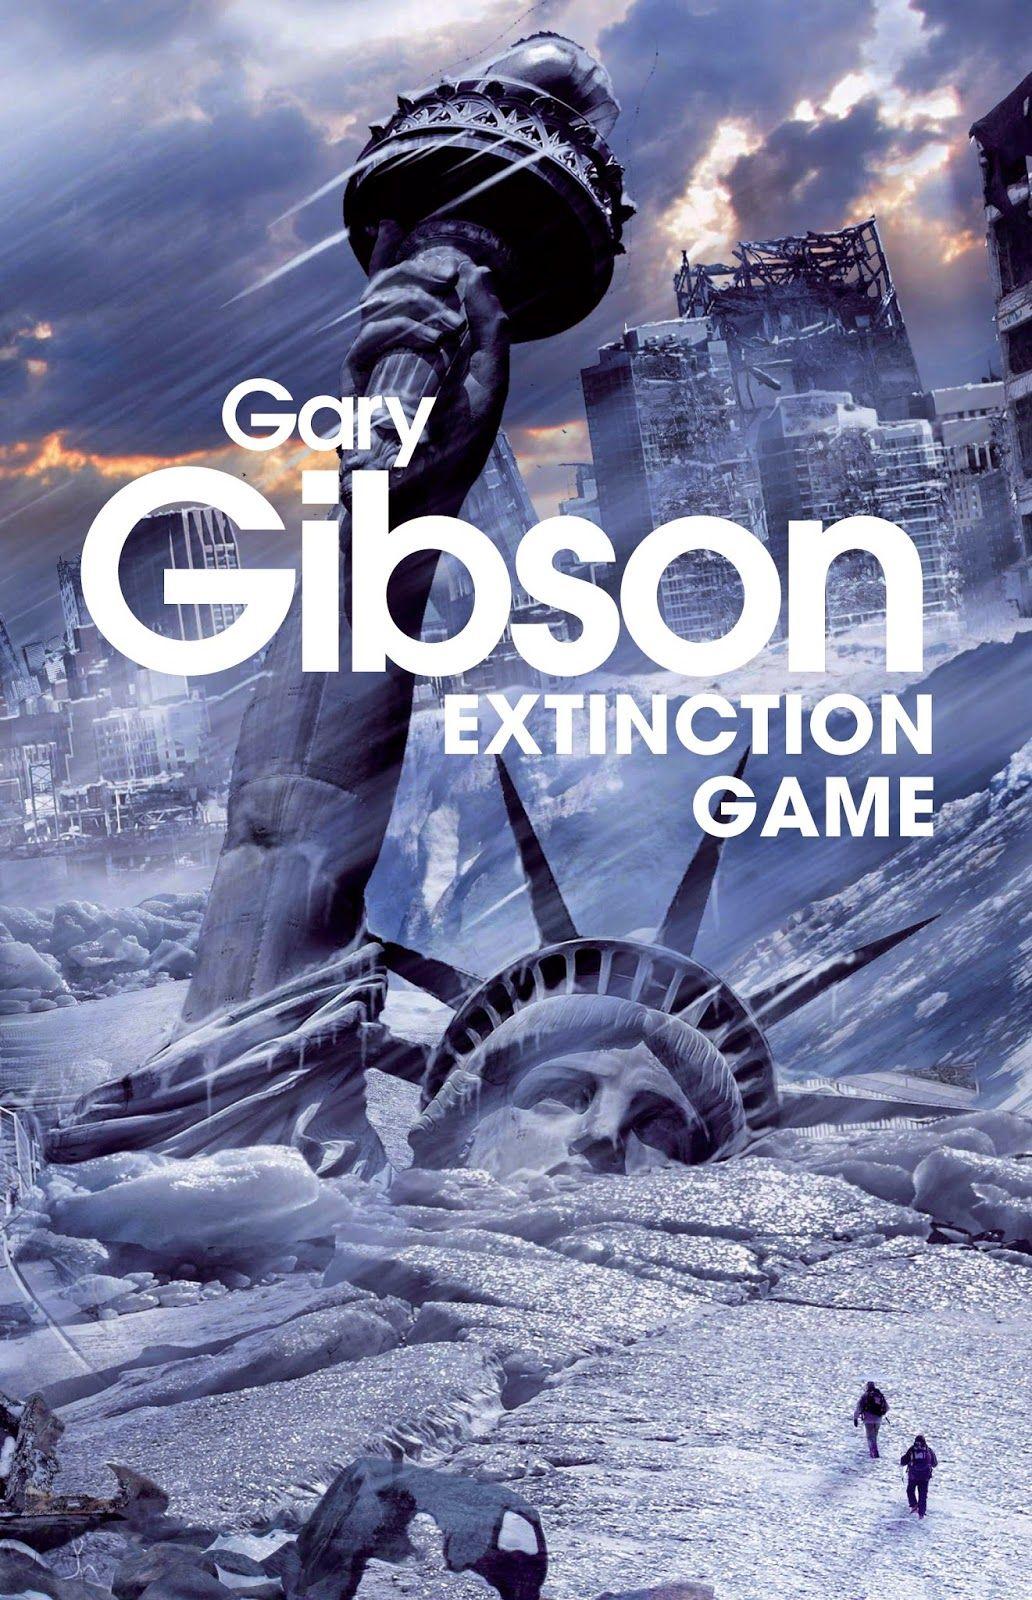 Sf Writer Gary Gibson Books